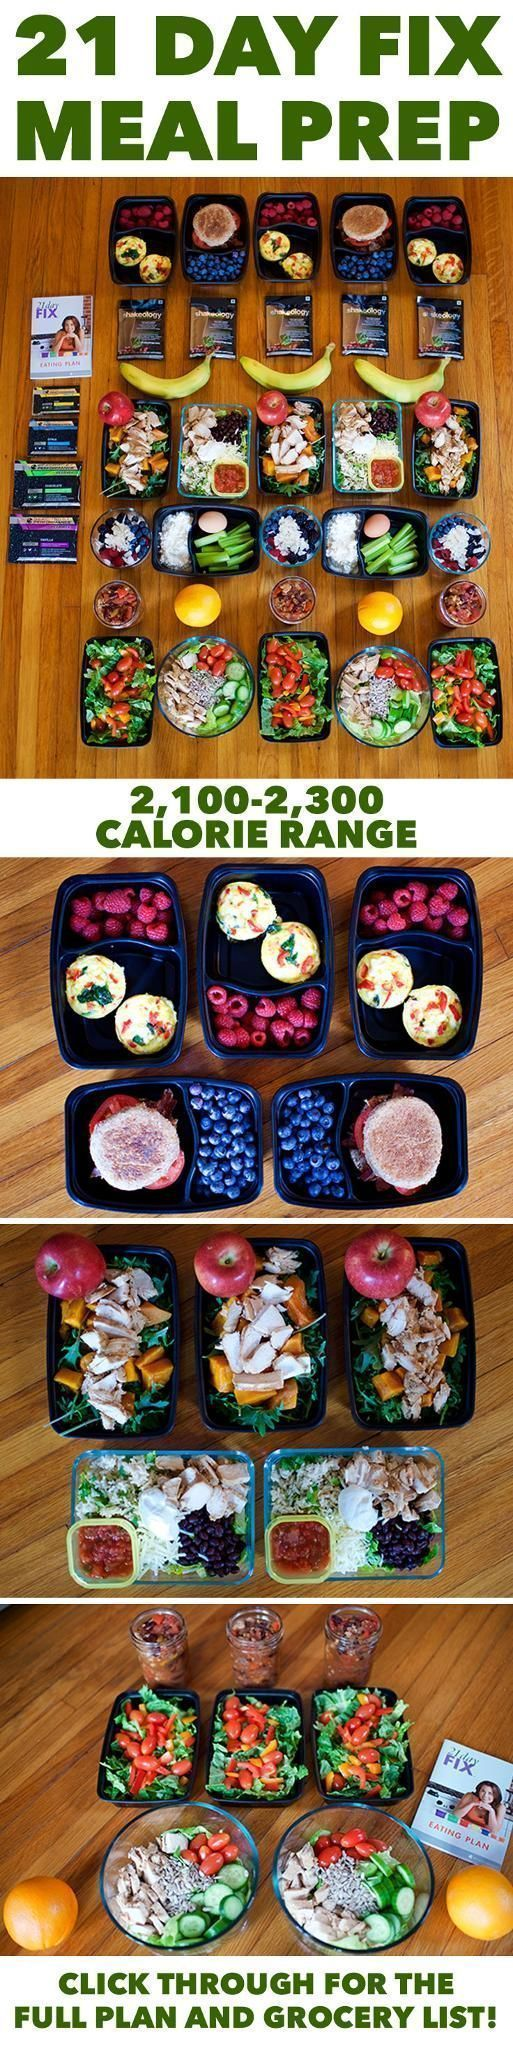 Meal Prep for the 21 Day Fix 2,100-2,300 Calorie Level -- Click through for a co..., #calori...